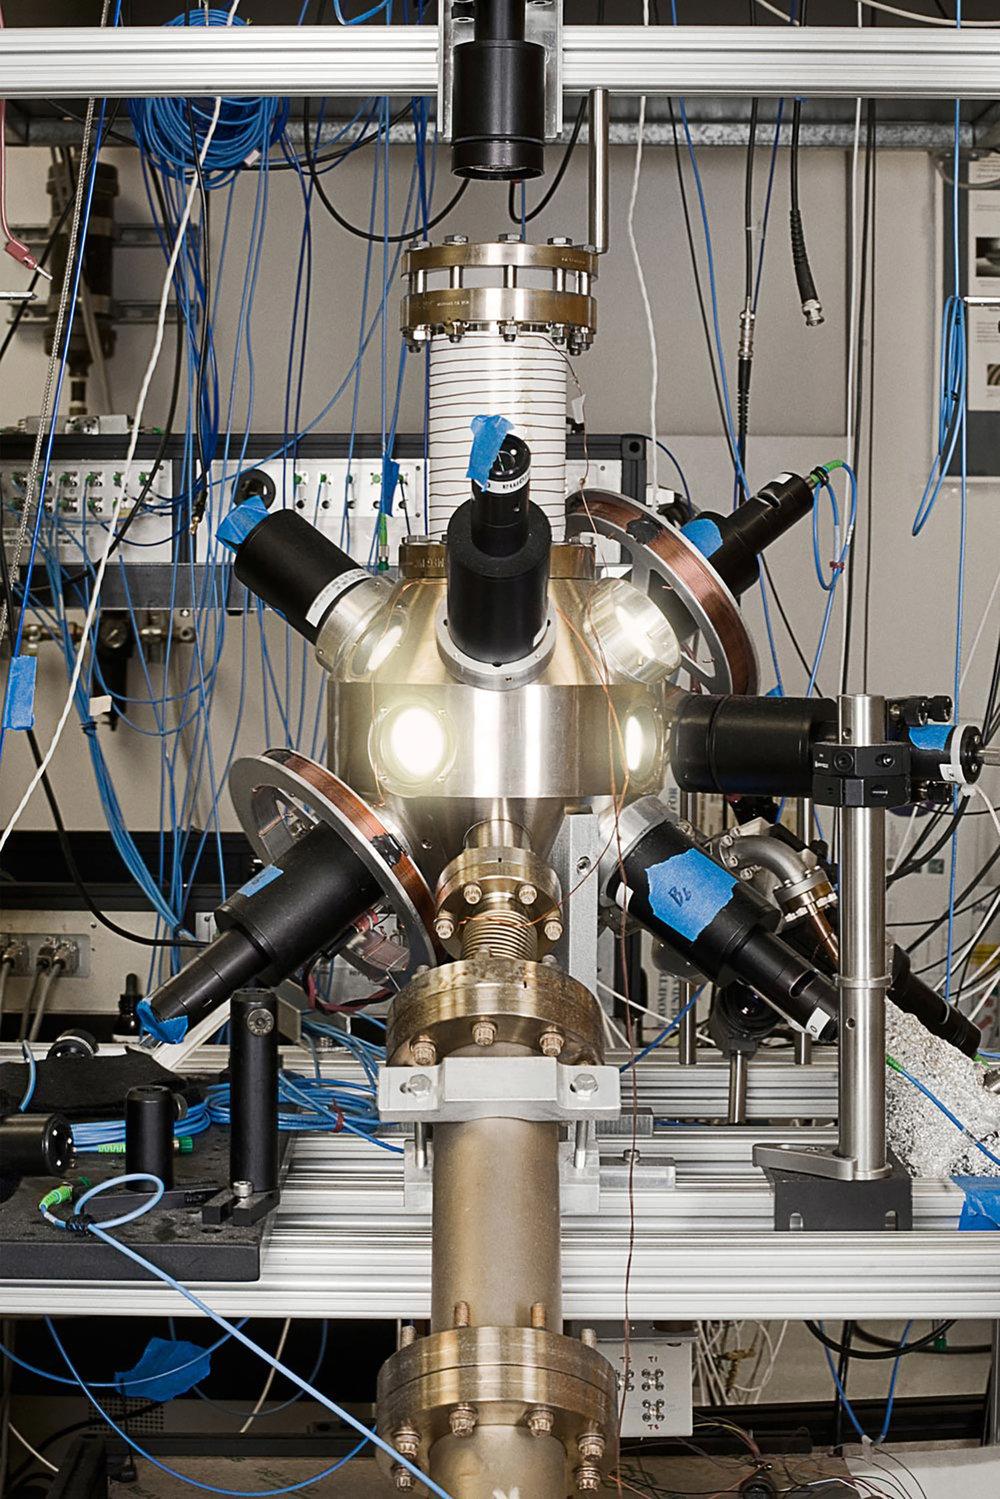 Gravity Gradiometer Prototype in the Quantum Lab at JPL